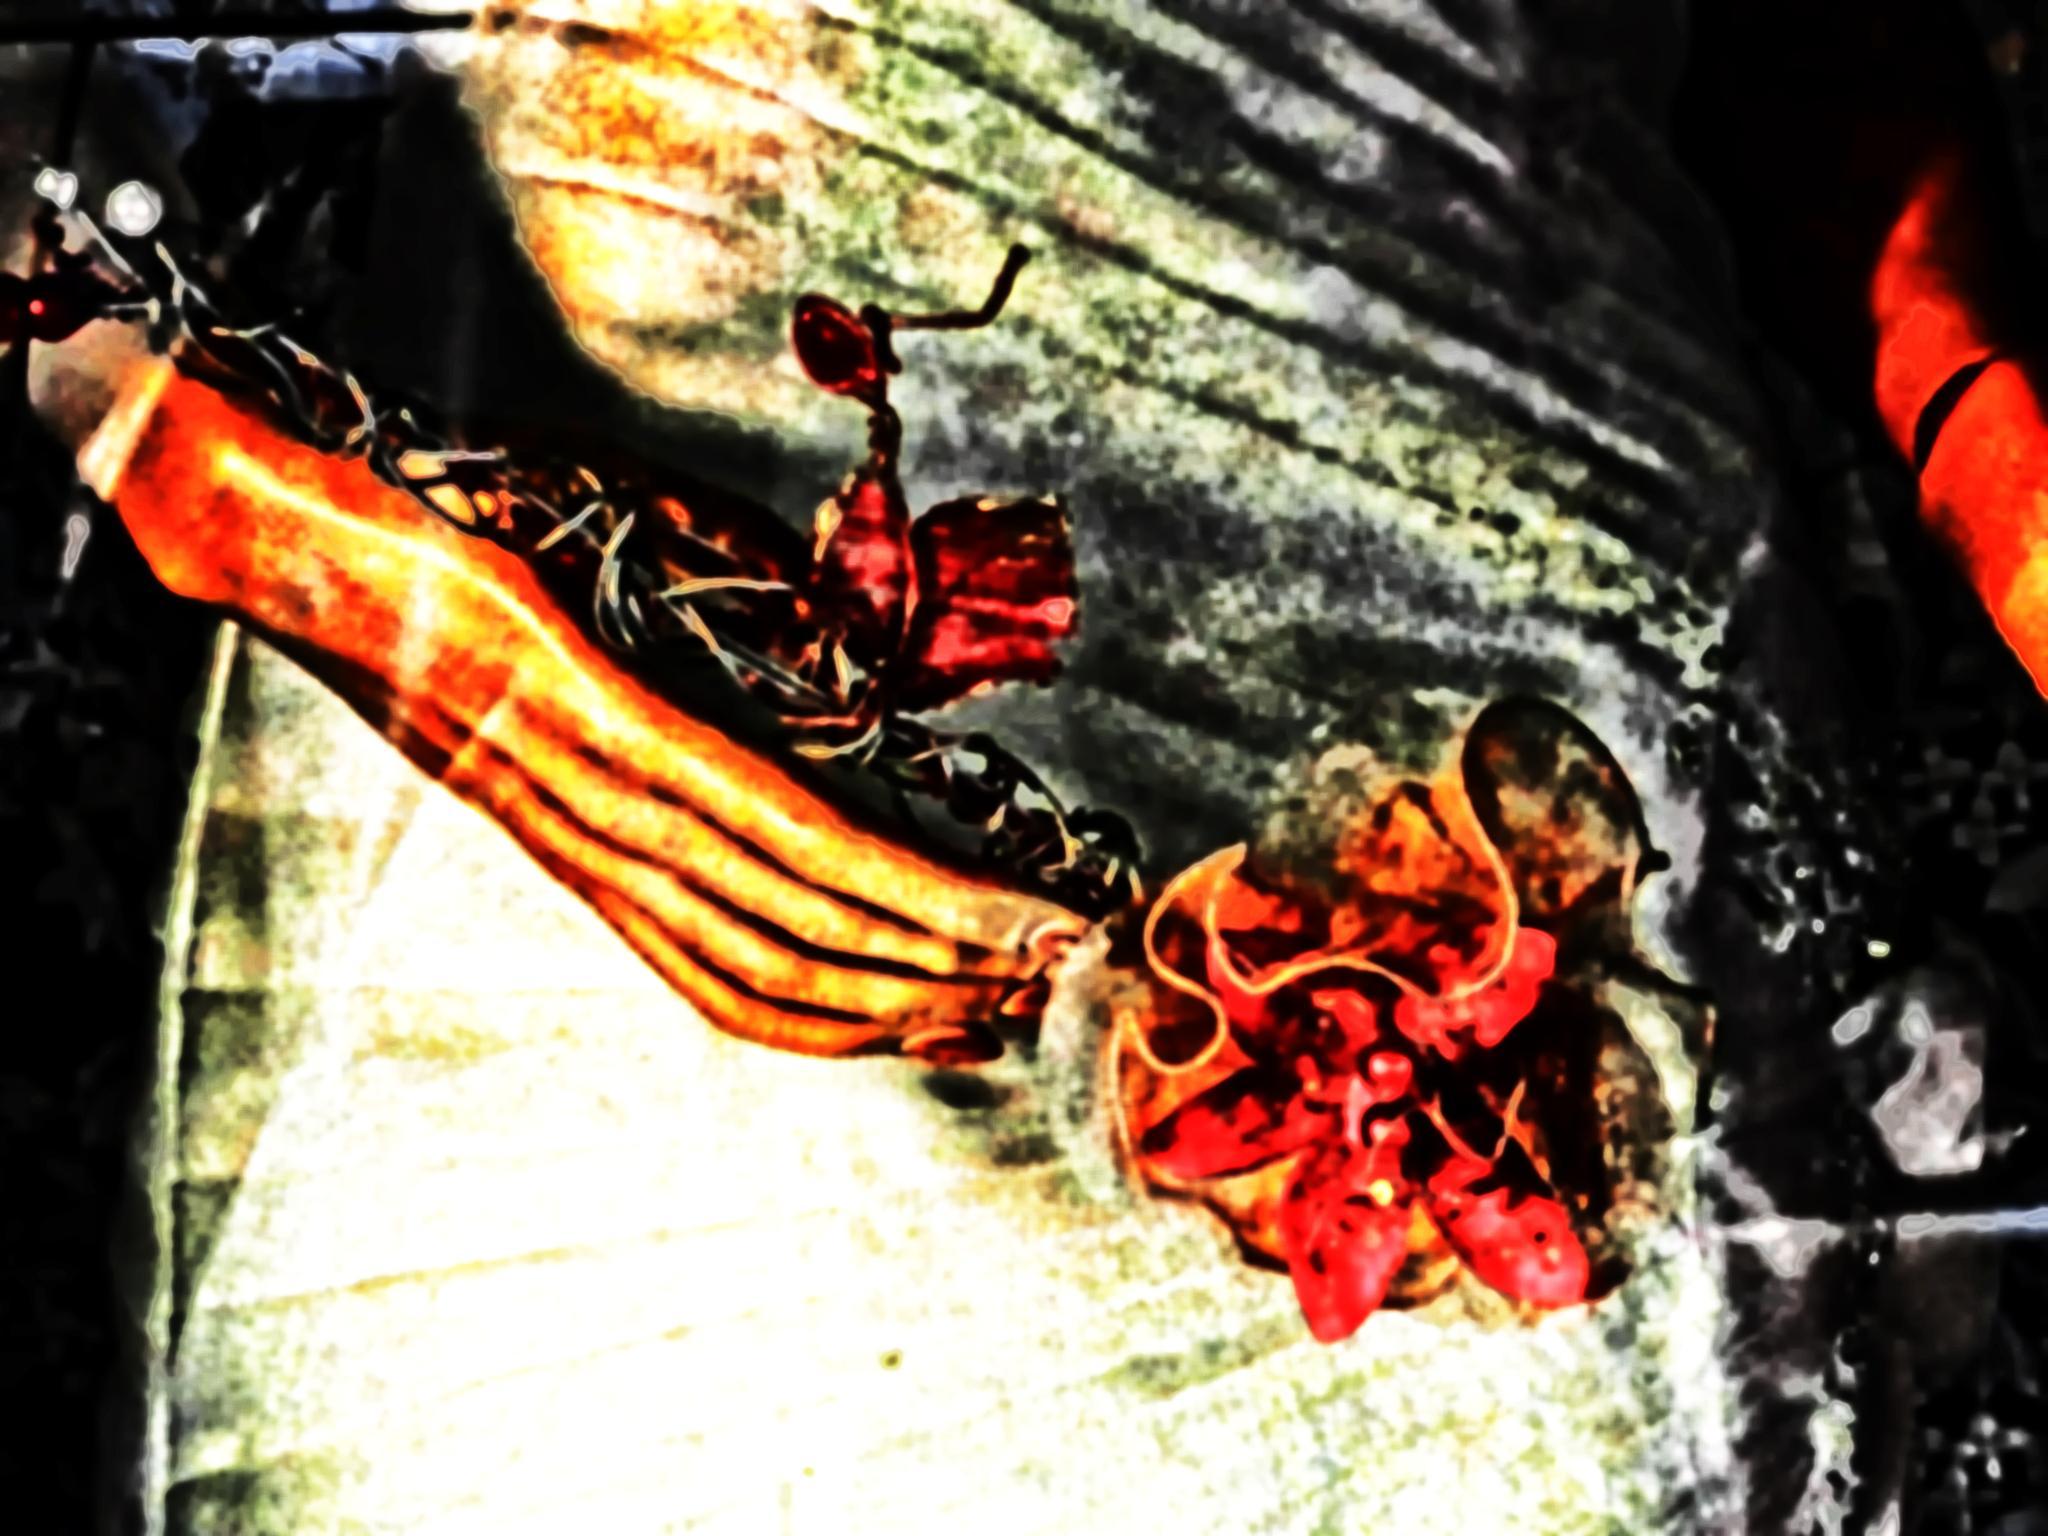 Untitled by sandra cid